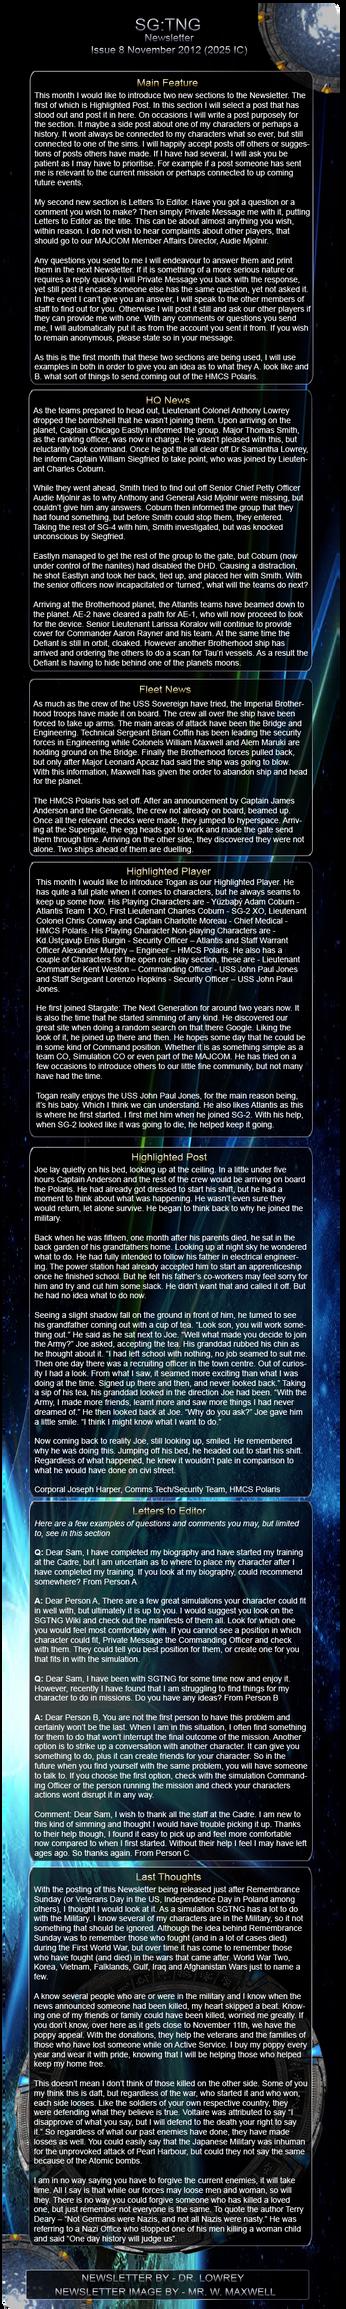 Newsletter-ISSUE8 by BlazeBlack